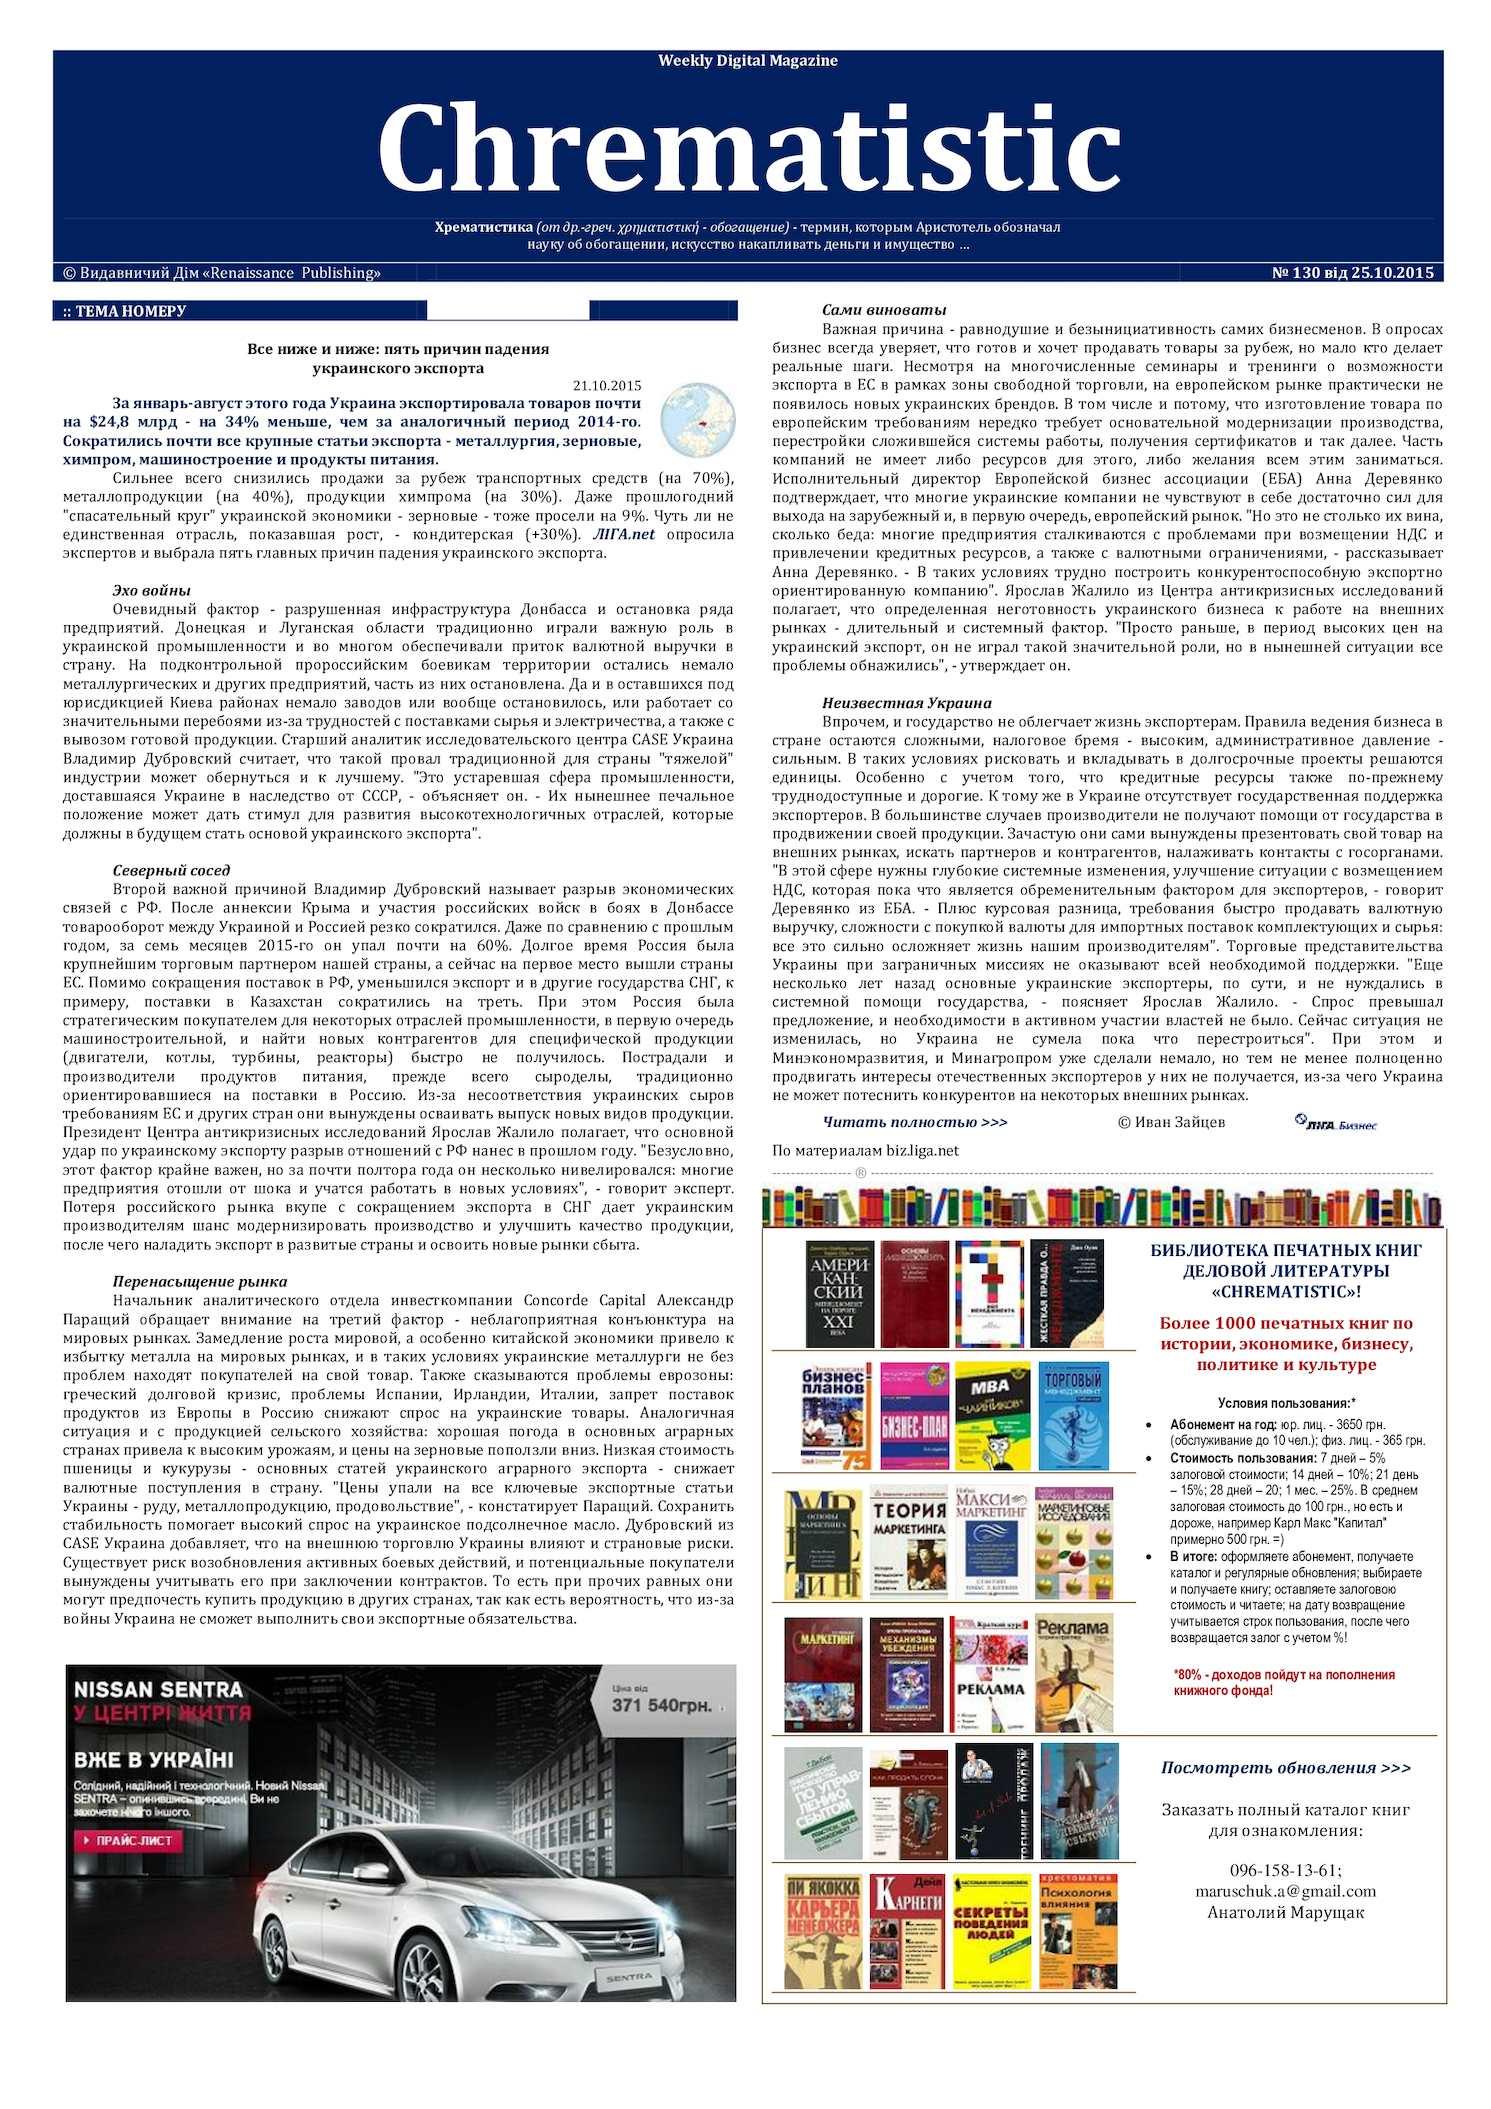 Calaméo - №130 Wdm «Chrematistic» от 25 10 2015 cb919adb6c977